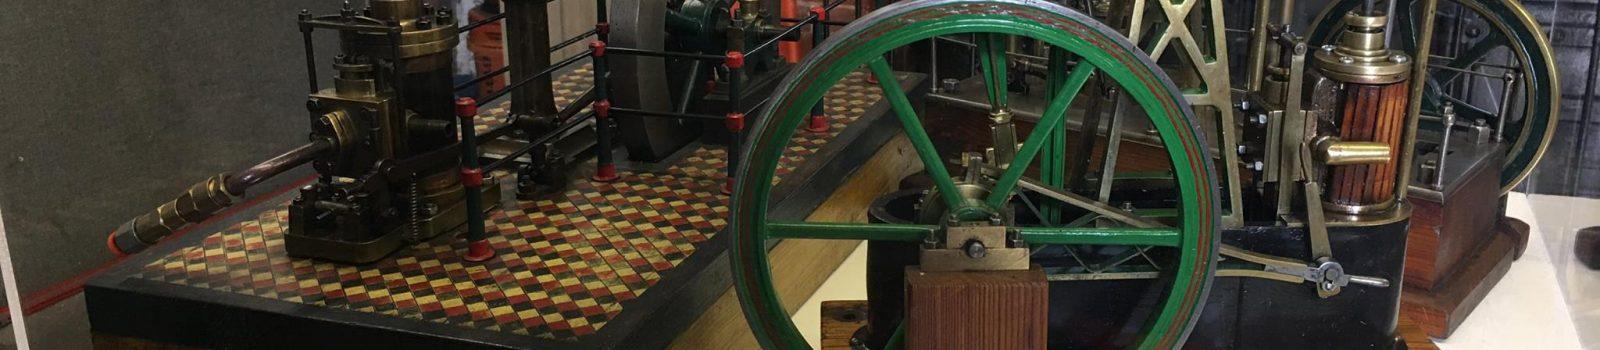 Miniature Beam Engines